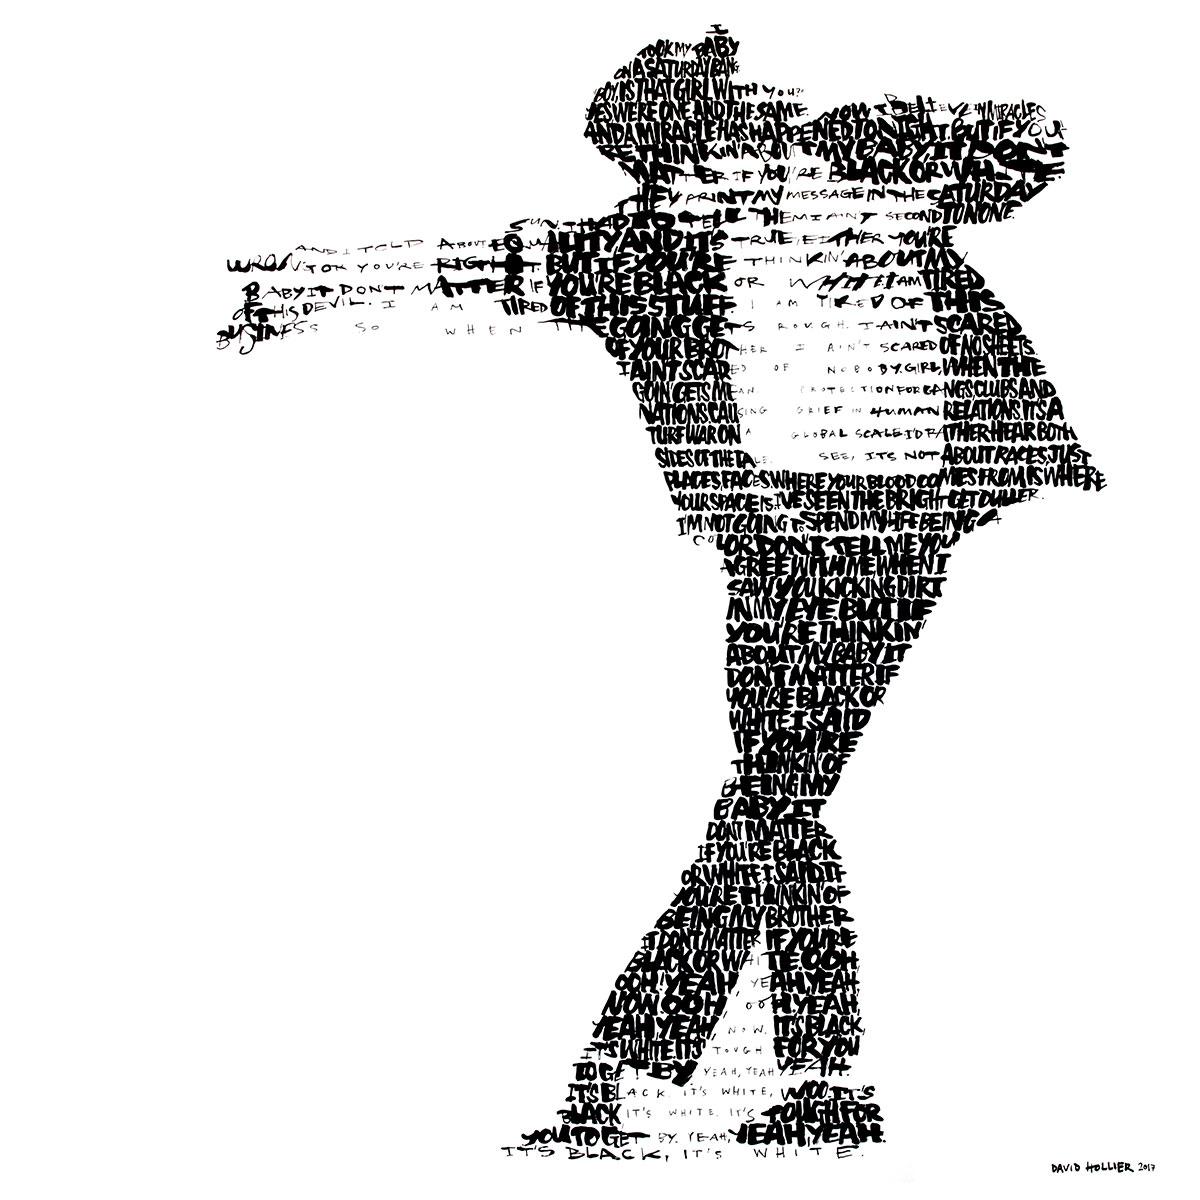 MichaelJackson - Copy.jpg